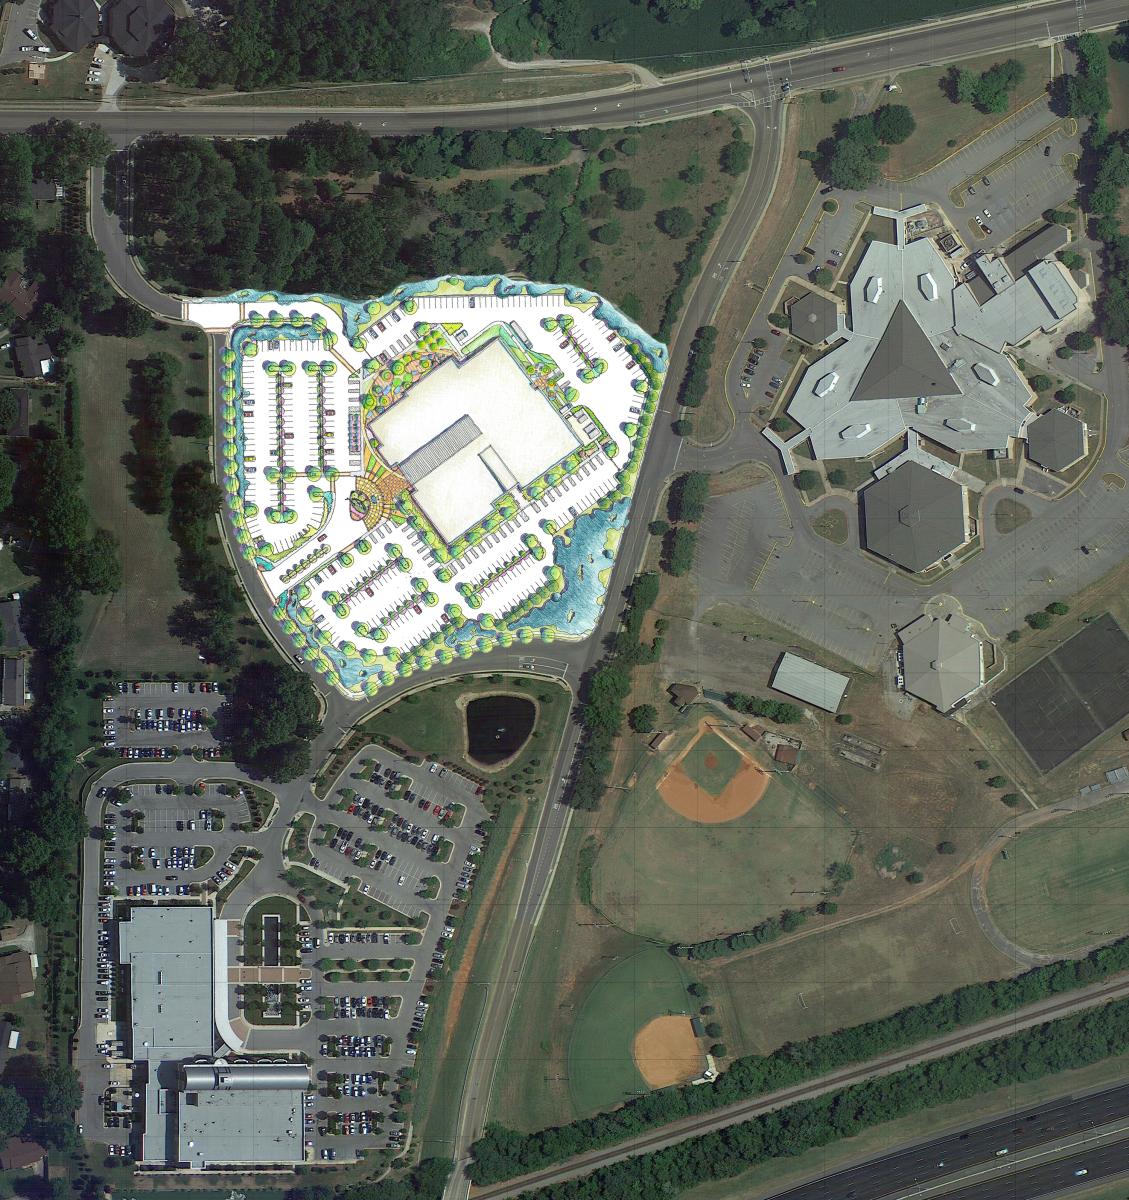 huntsville_va_color site plan aerial overlay